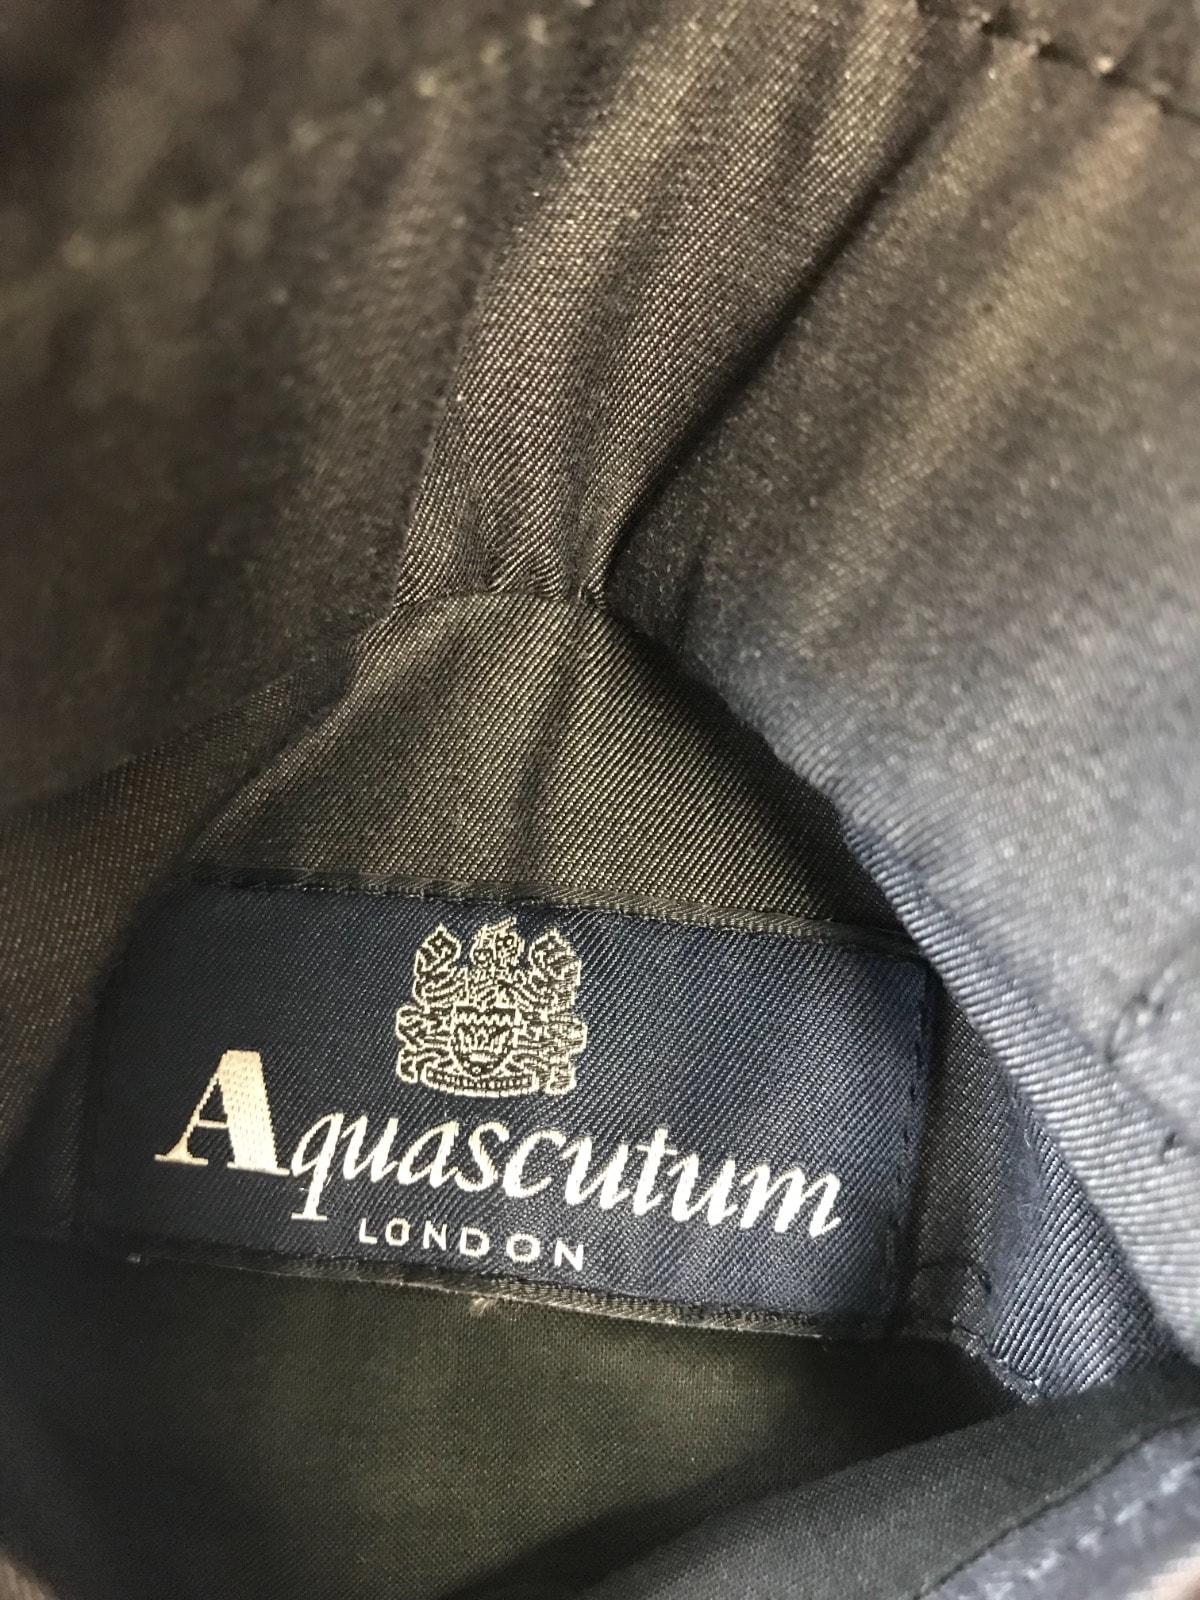 Aquascutum(アクアスキュータム)のコート